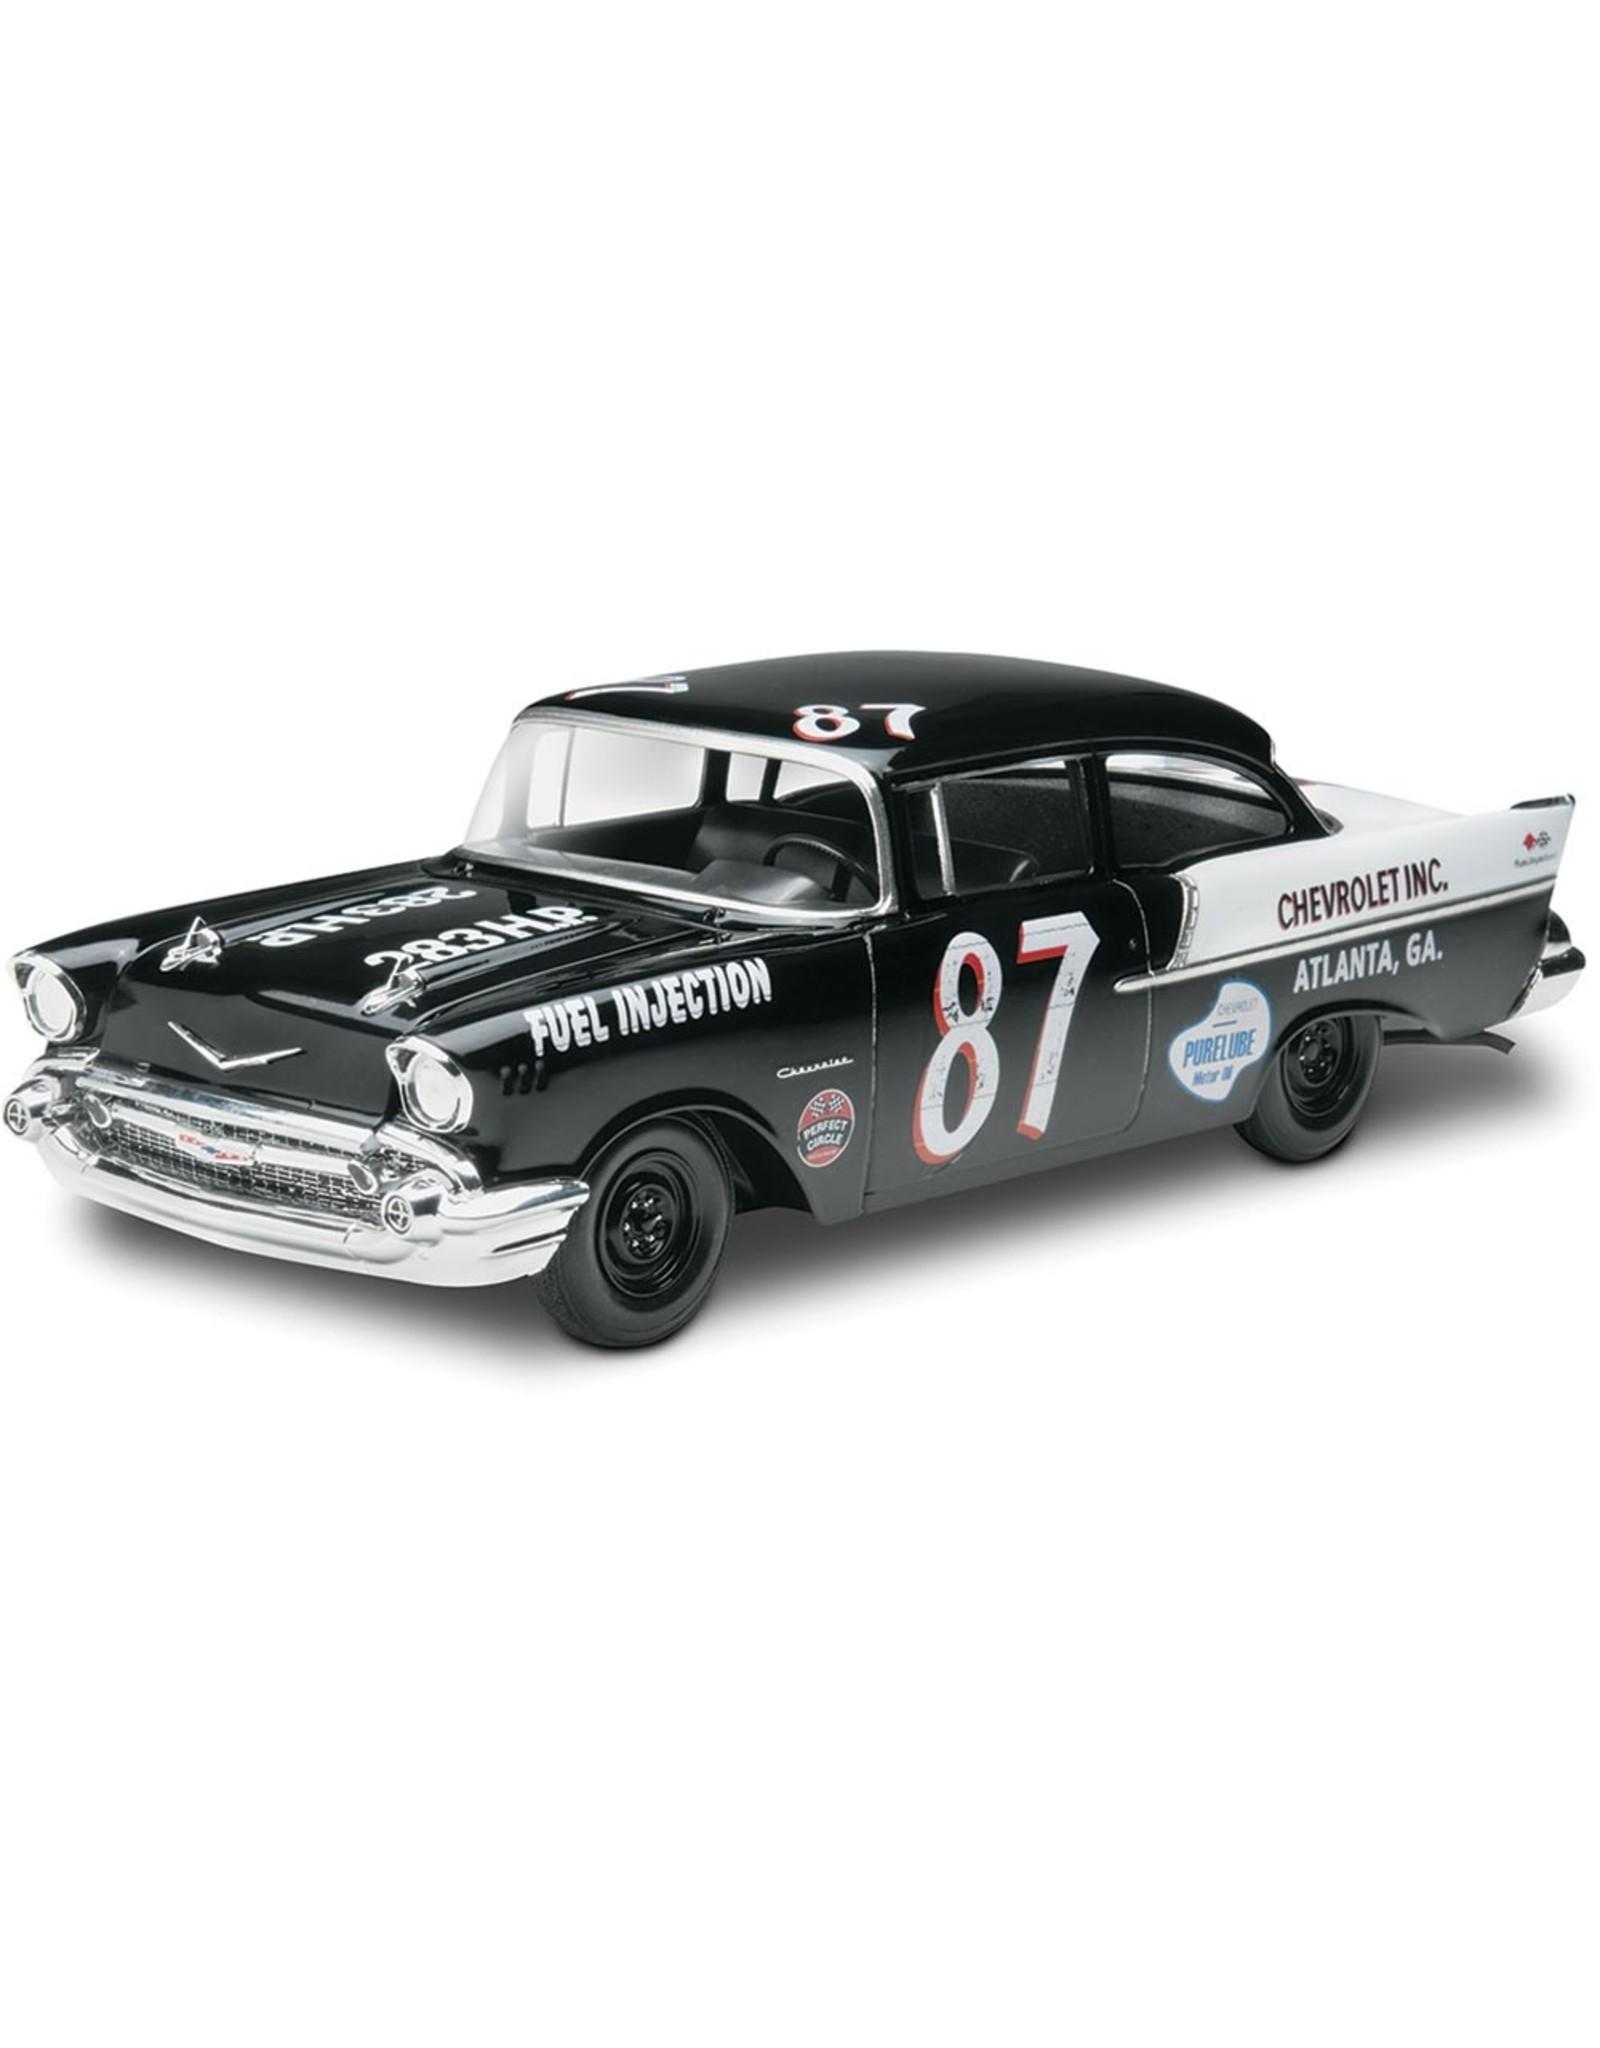 Revell 4441 - '57 Chevy Black Widow 2n1 1/25